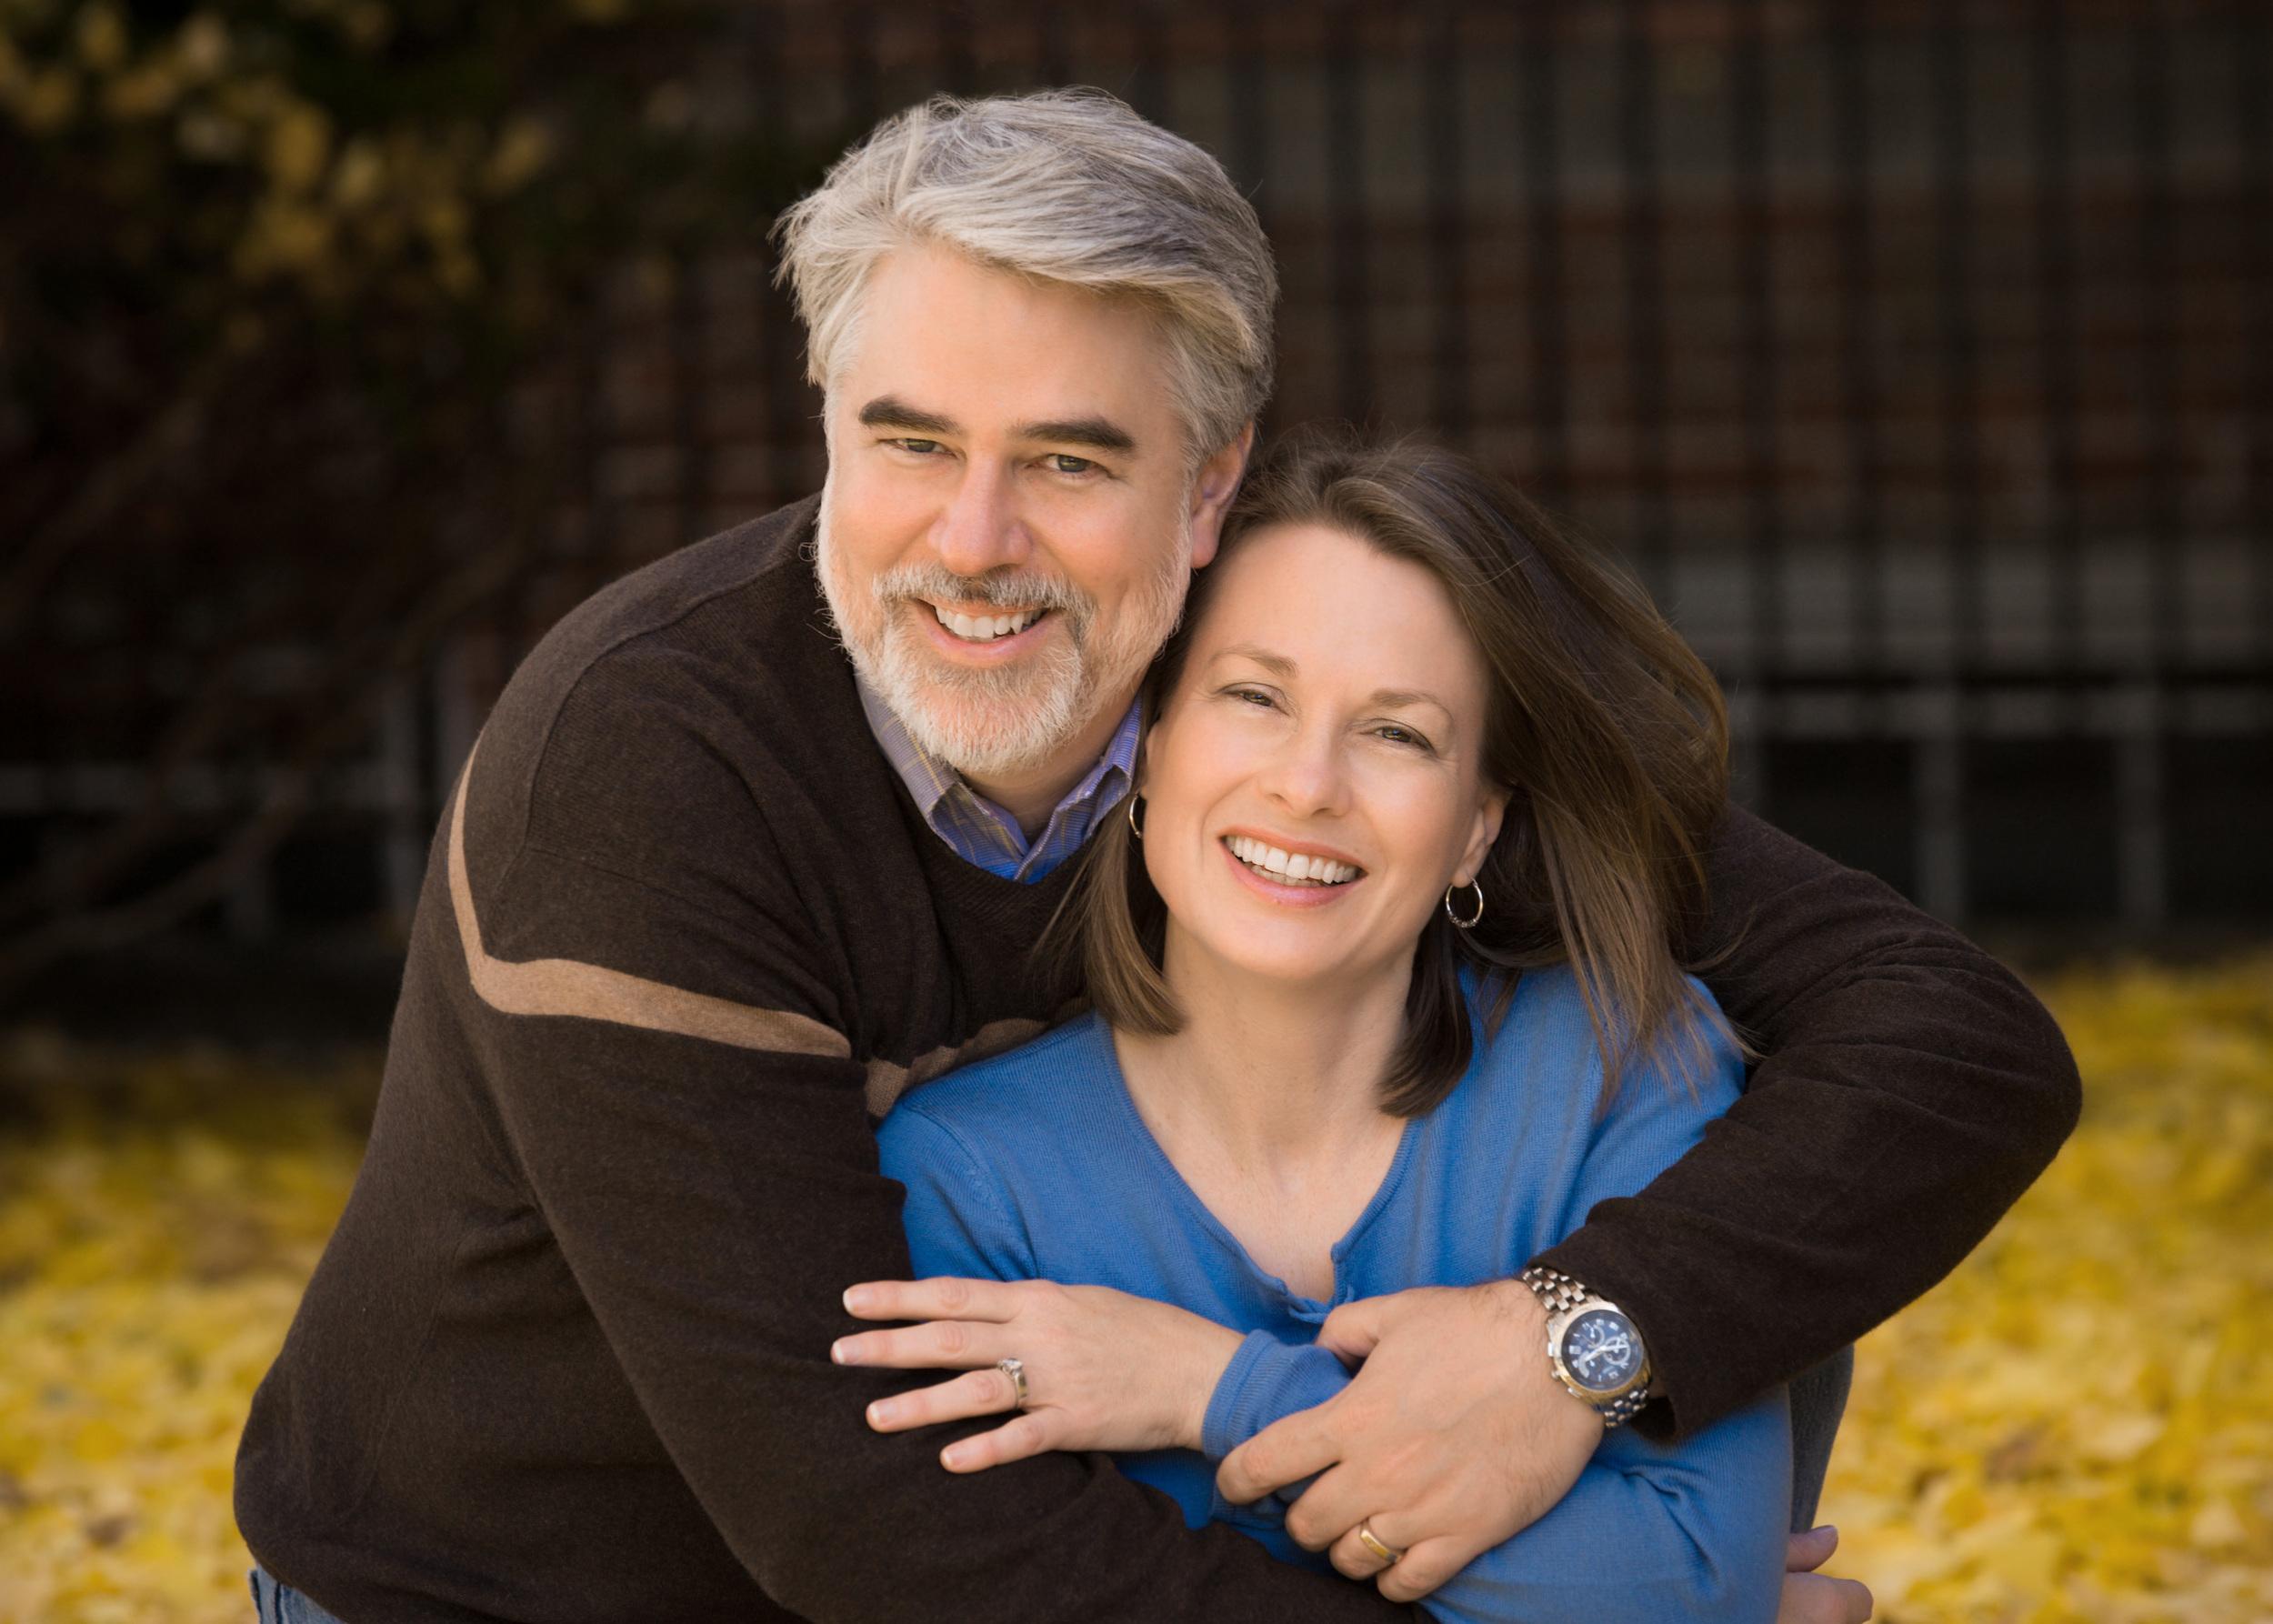 Scott and Valorie Walz